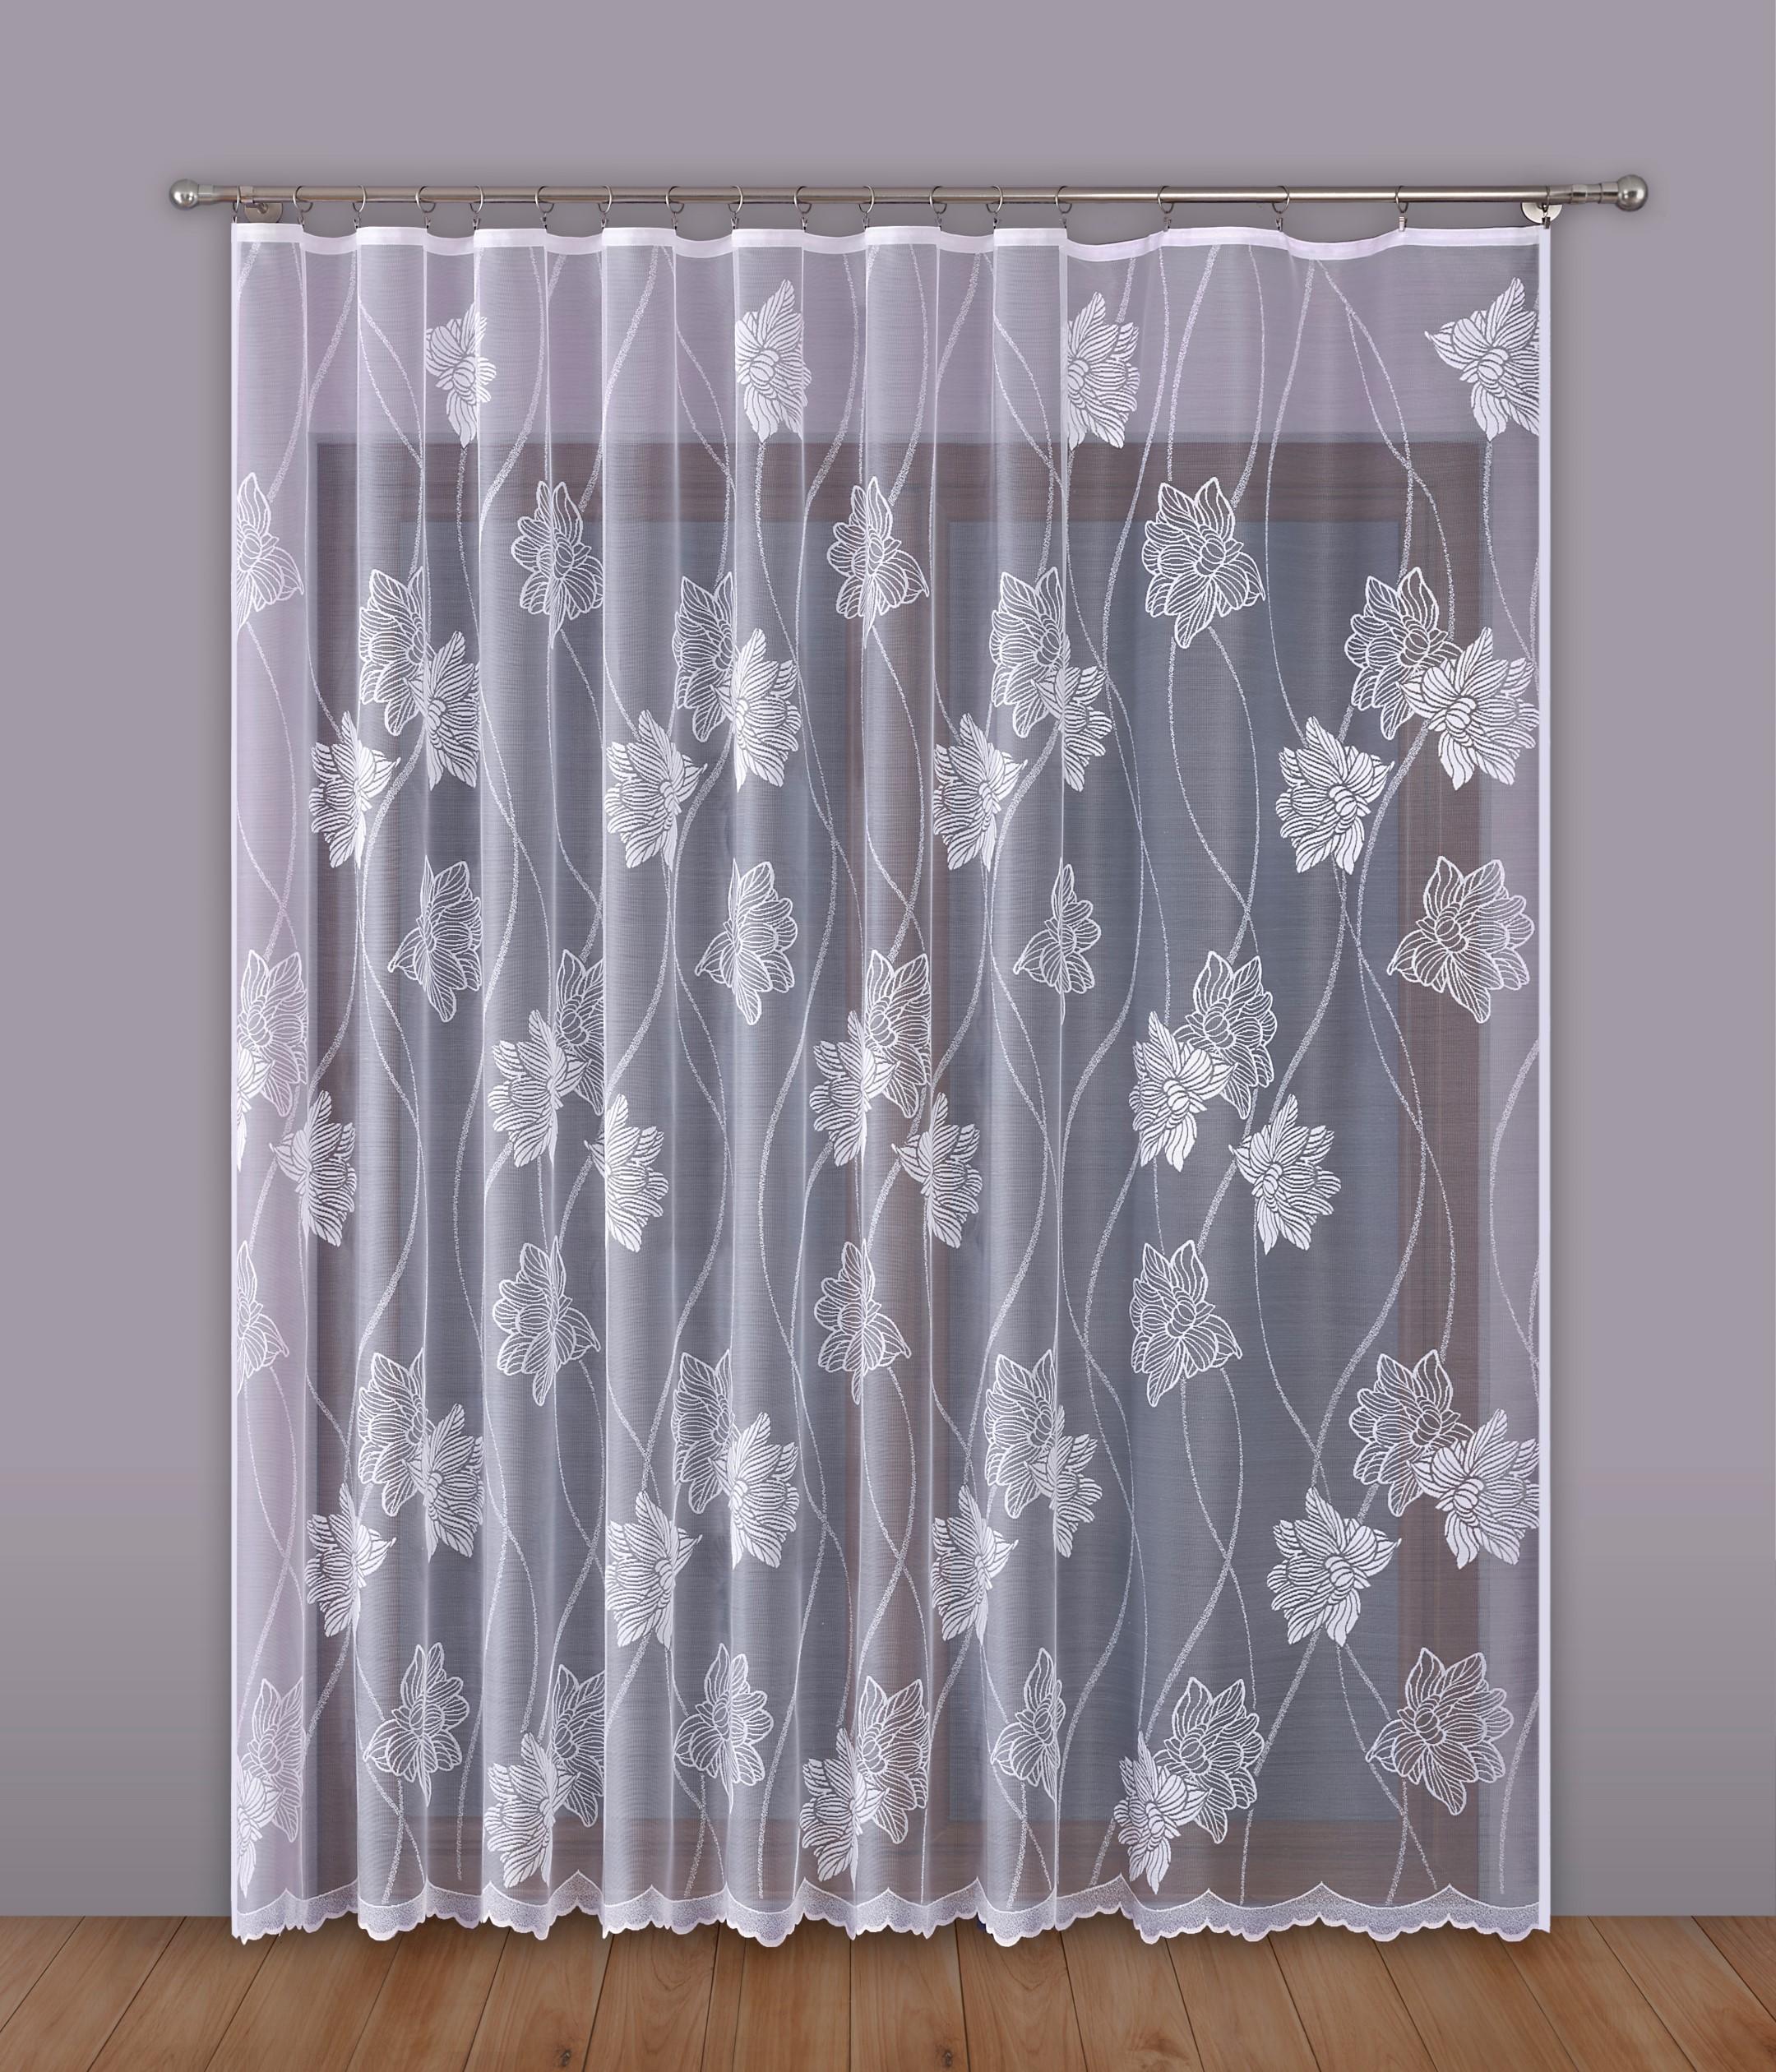 Шторы Primavera Классические шторы Thyrza Цвет: Белый шторы primavera классические шторы maev цвет салатовый